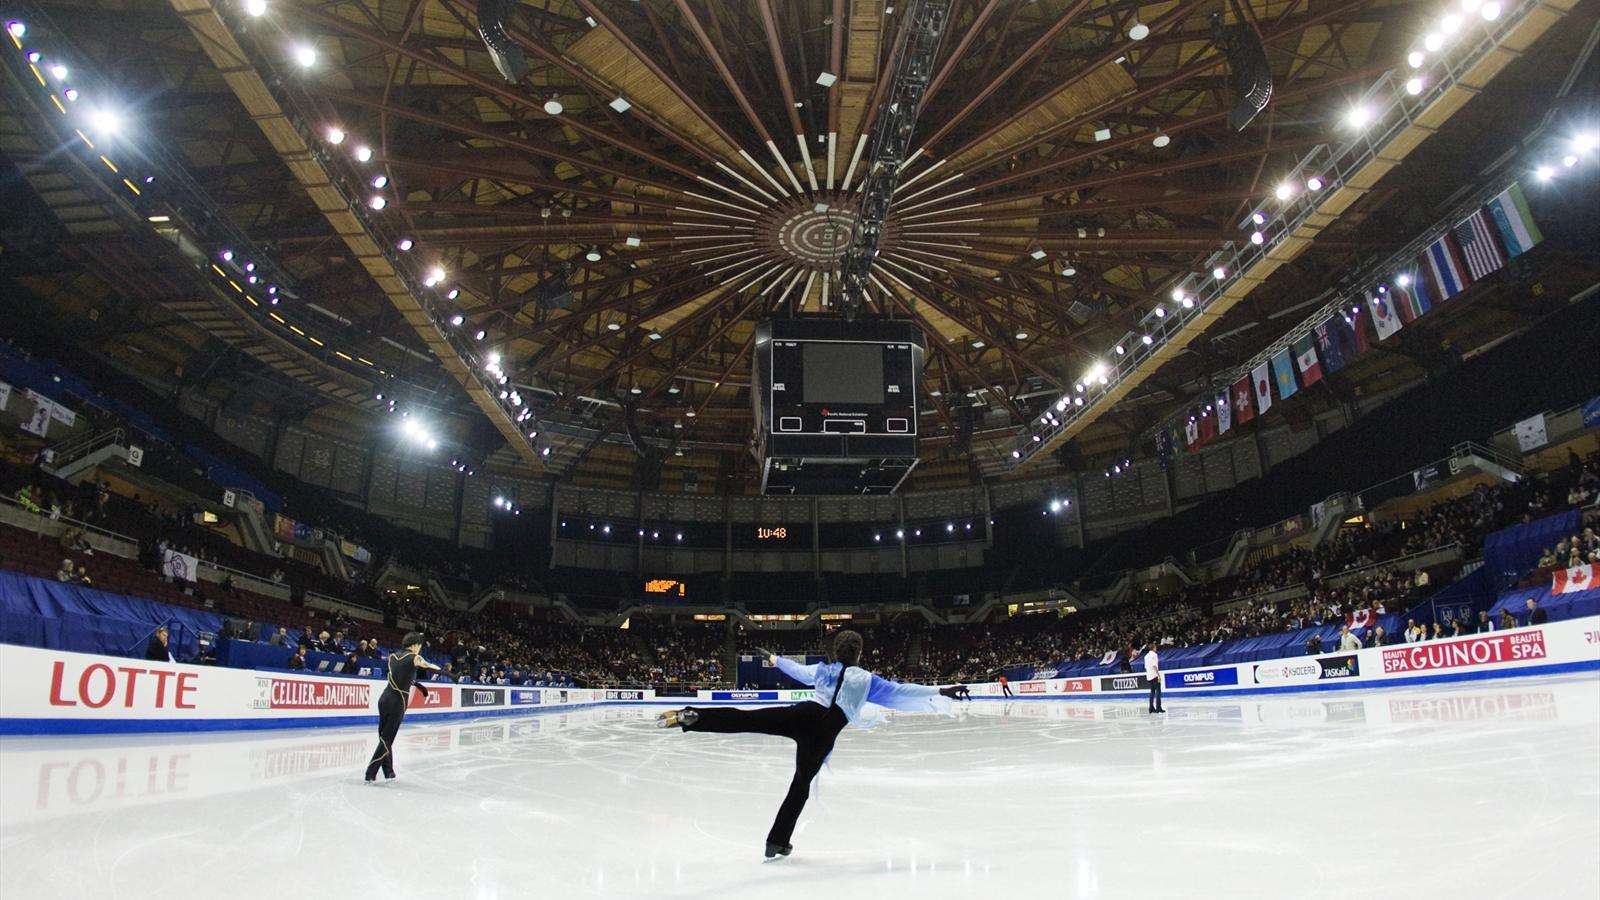 чемпионат мира по фигурному катанию сроки проведения